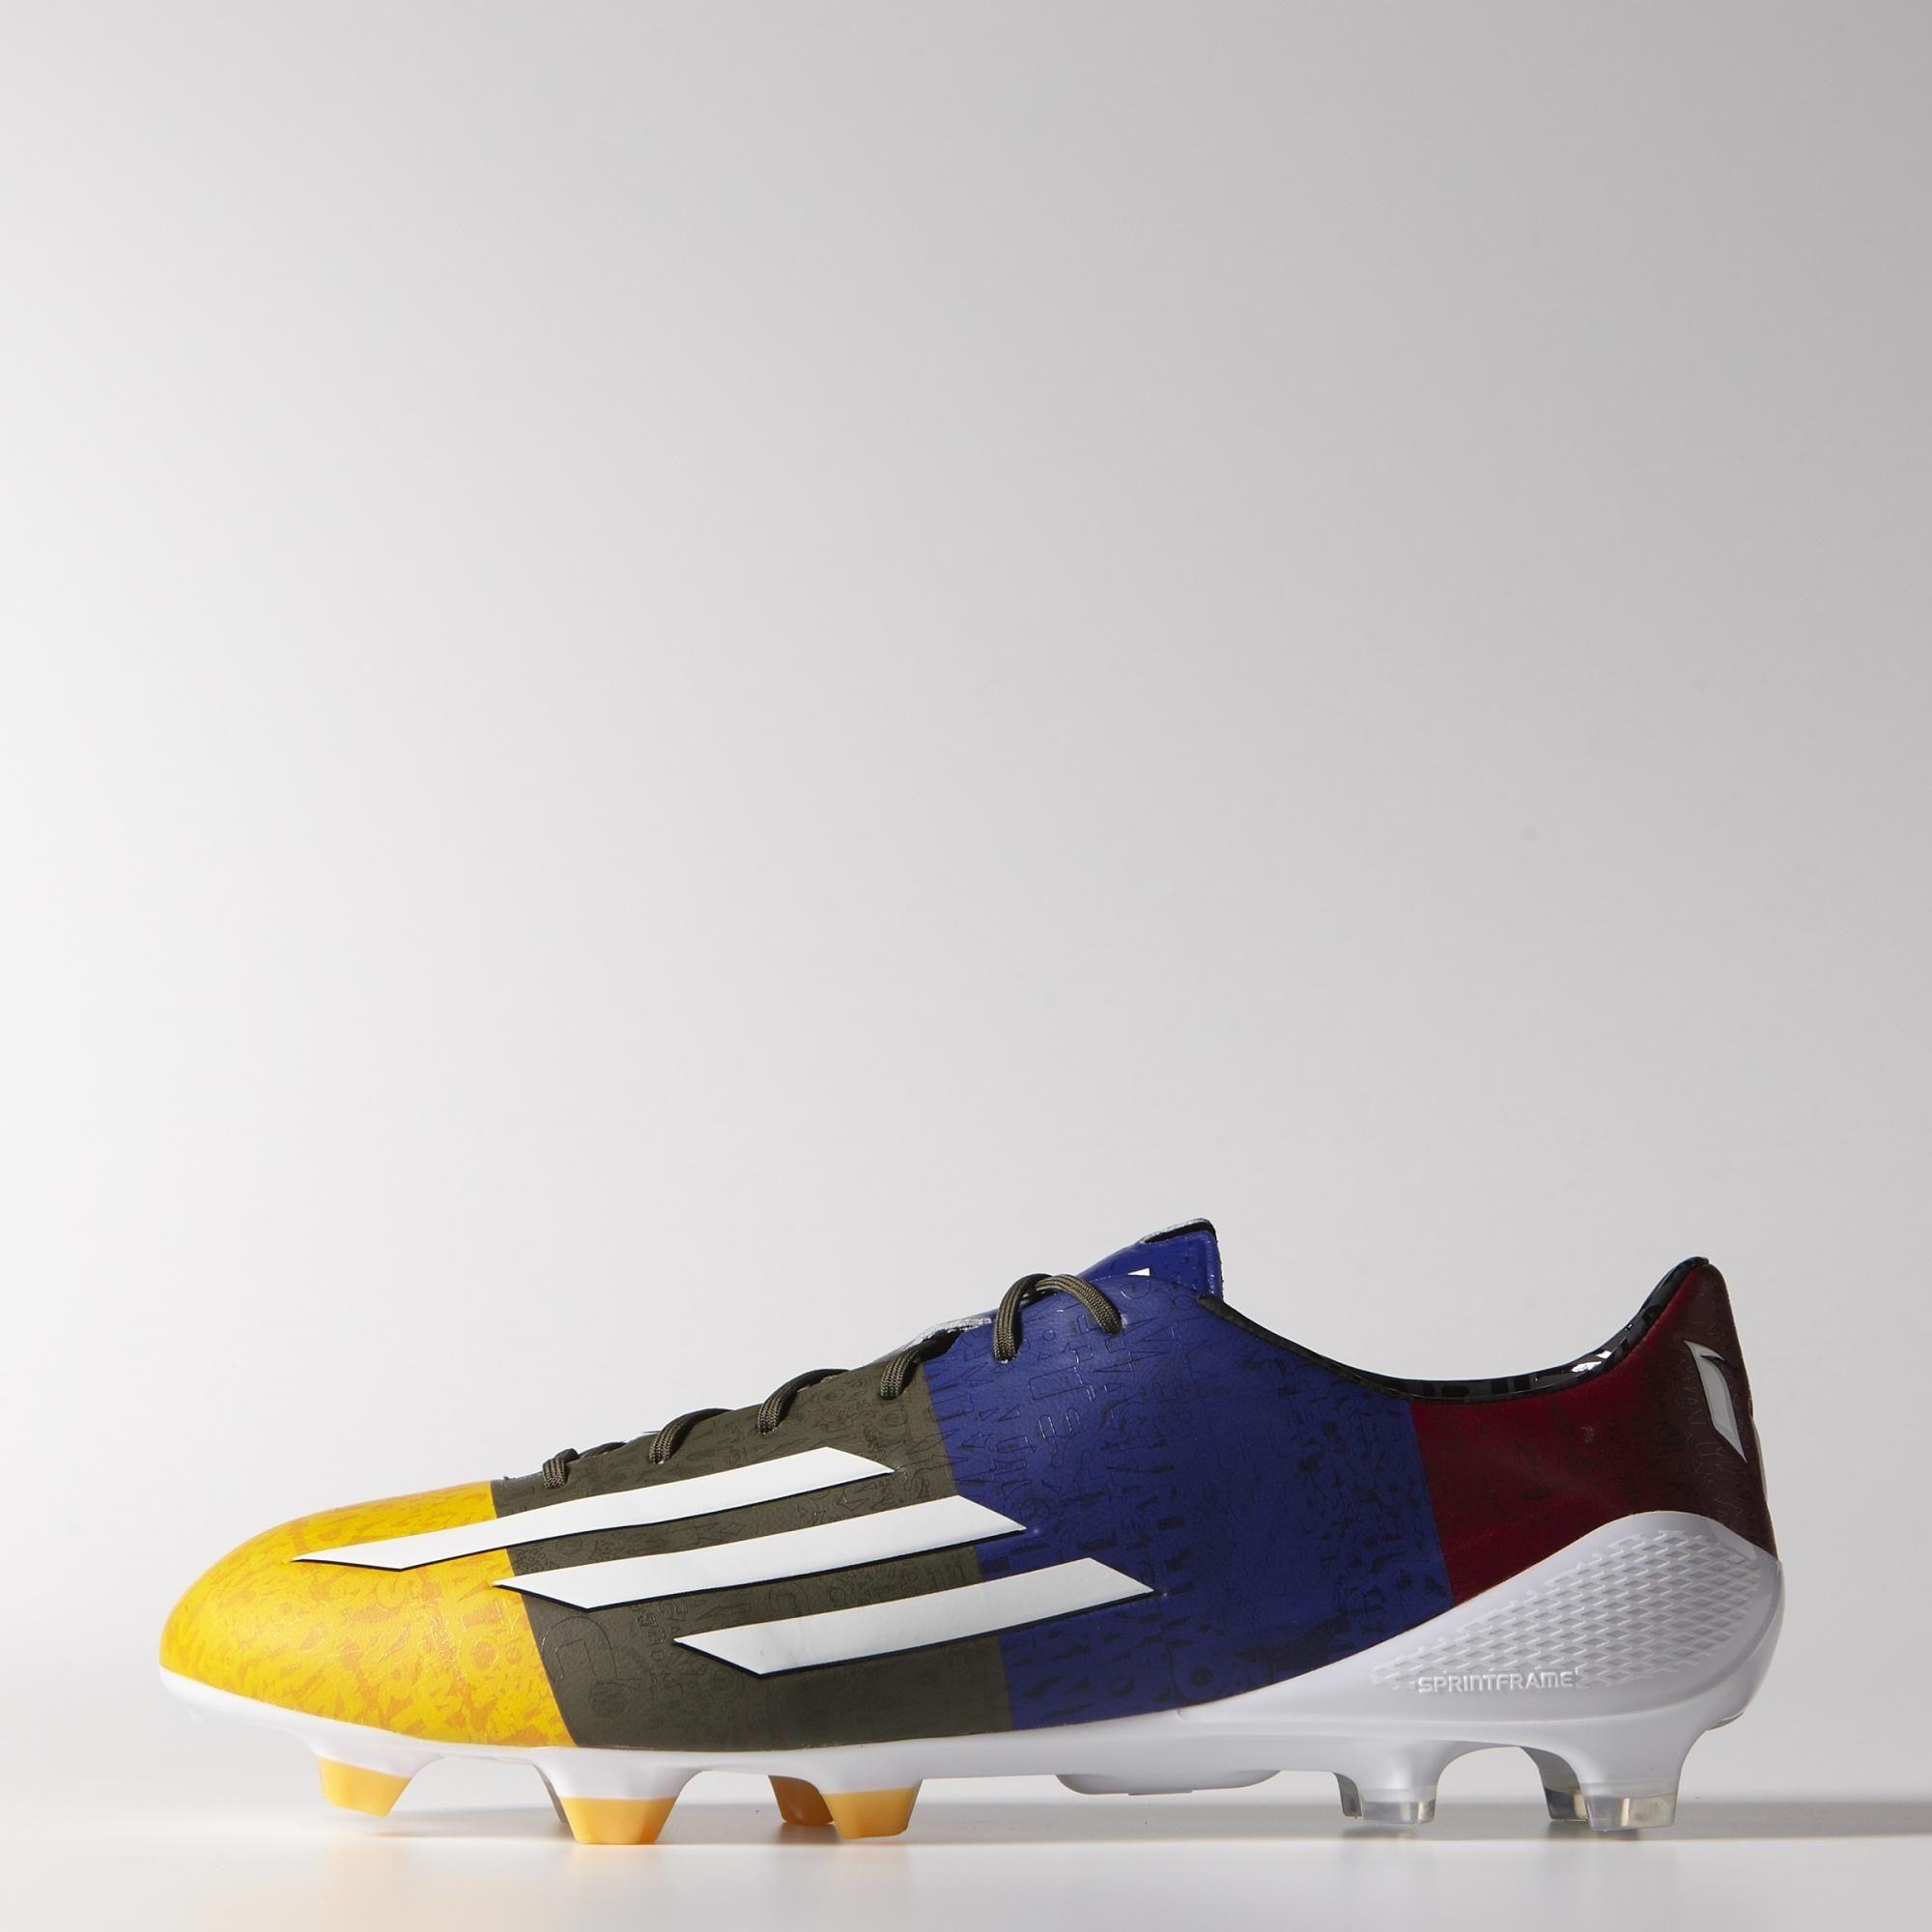 9a10d511fa4 ... spain click to enlarge image adidas f50 adizero fg messi boots 377ab  eb842